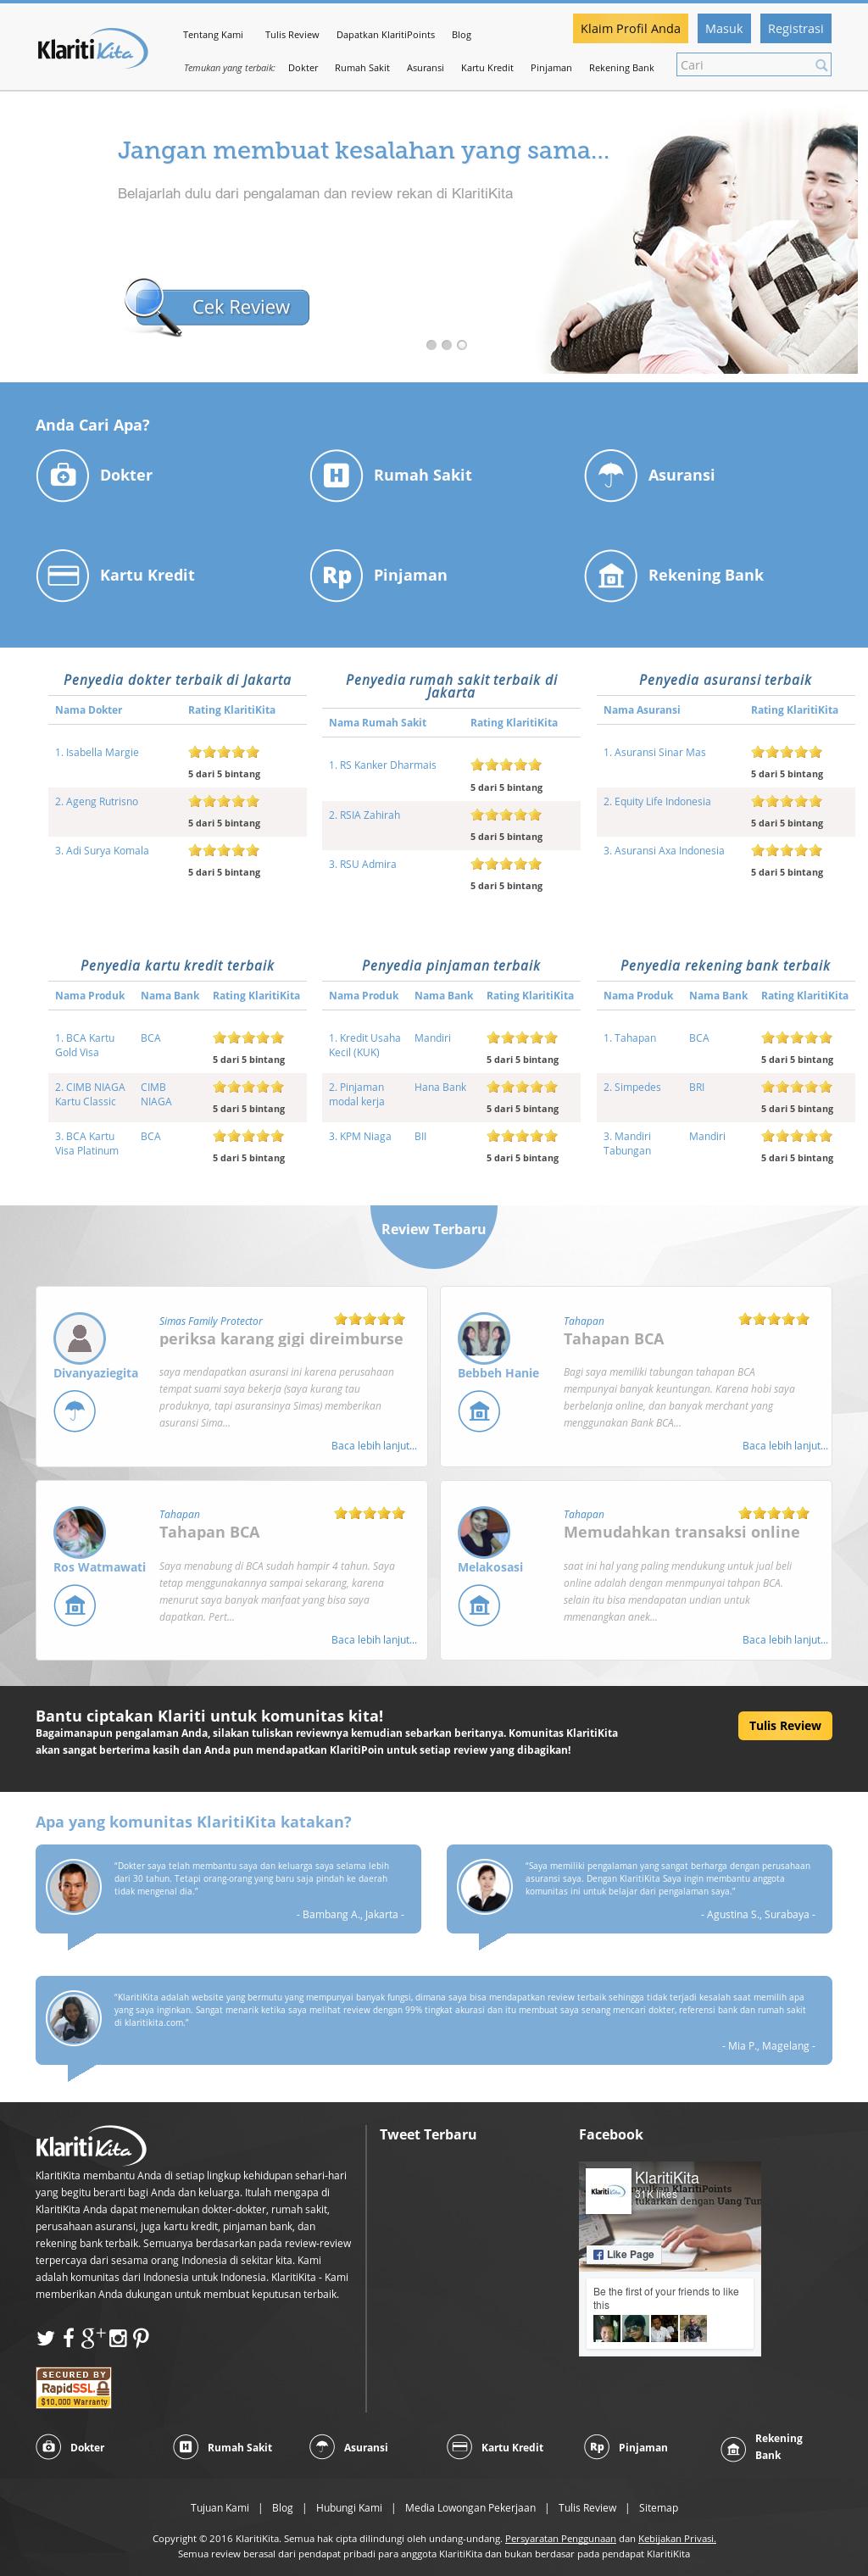 Klaritikita Competitors Revenue And Employees Owler Company Profile Pindah Kredit0